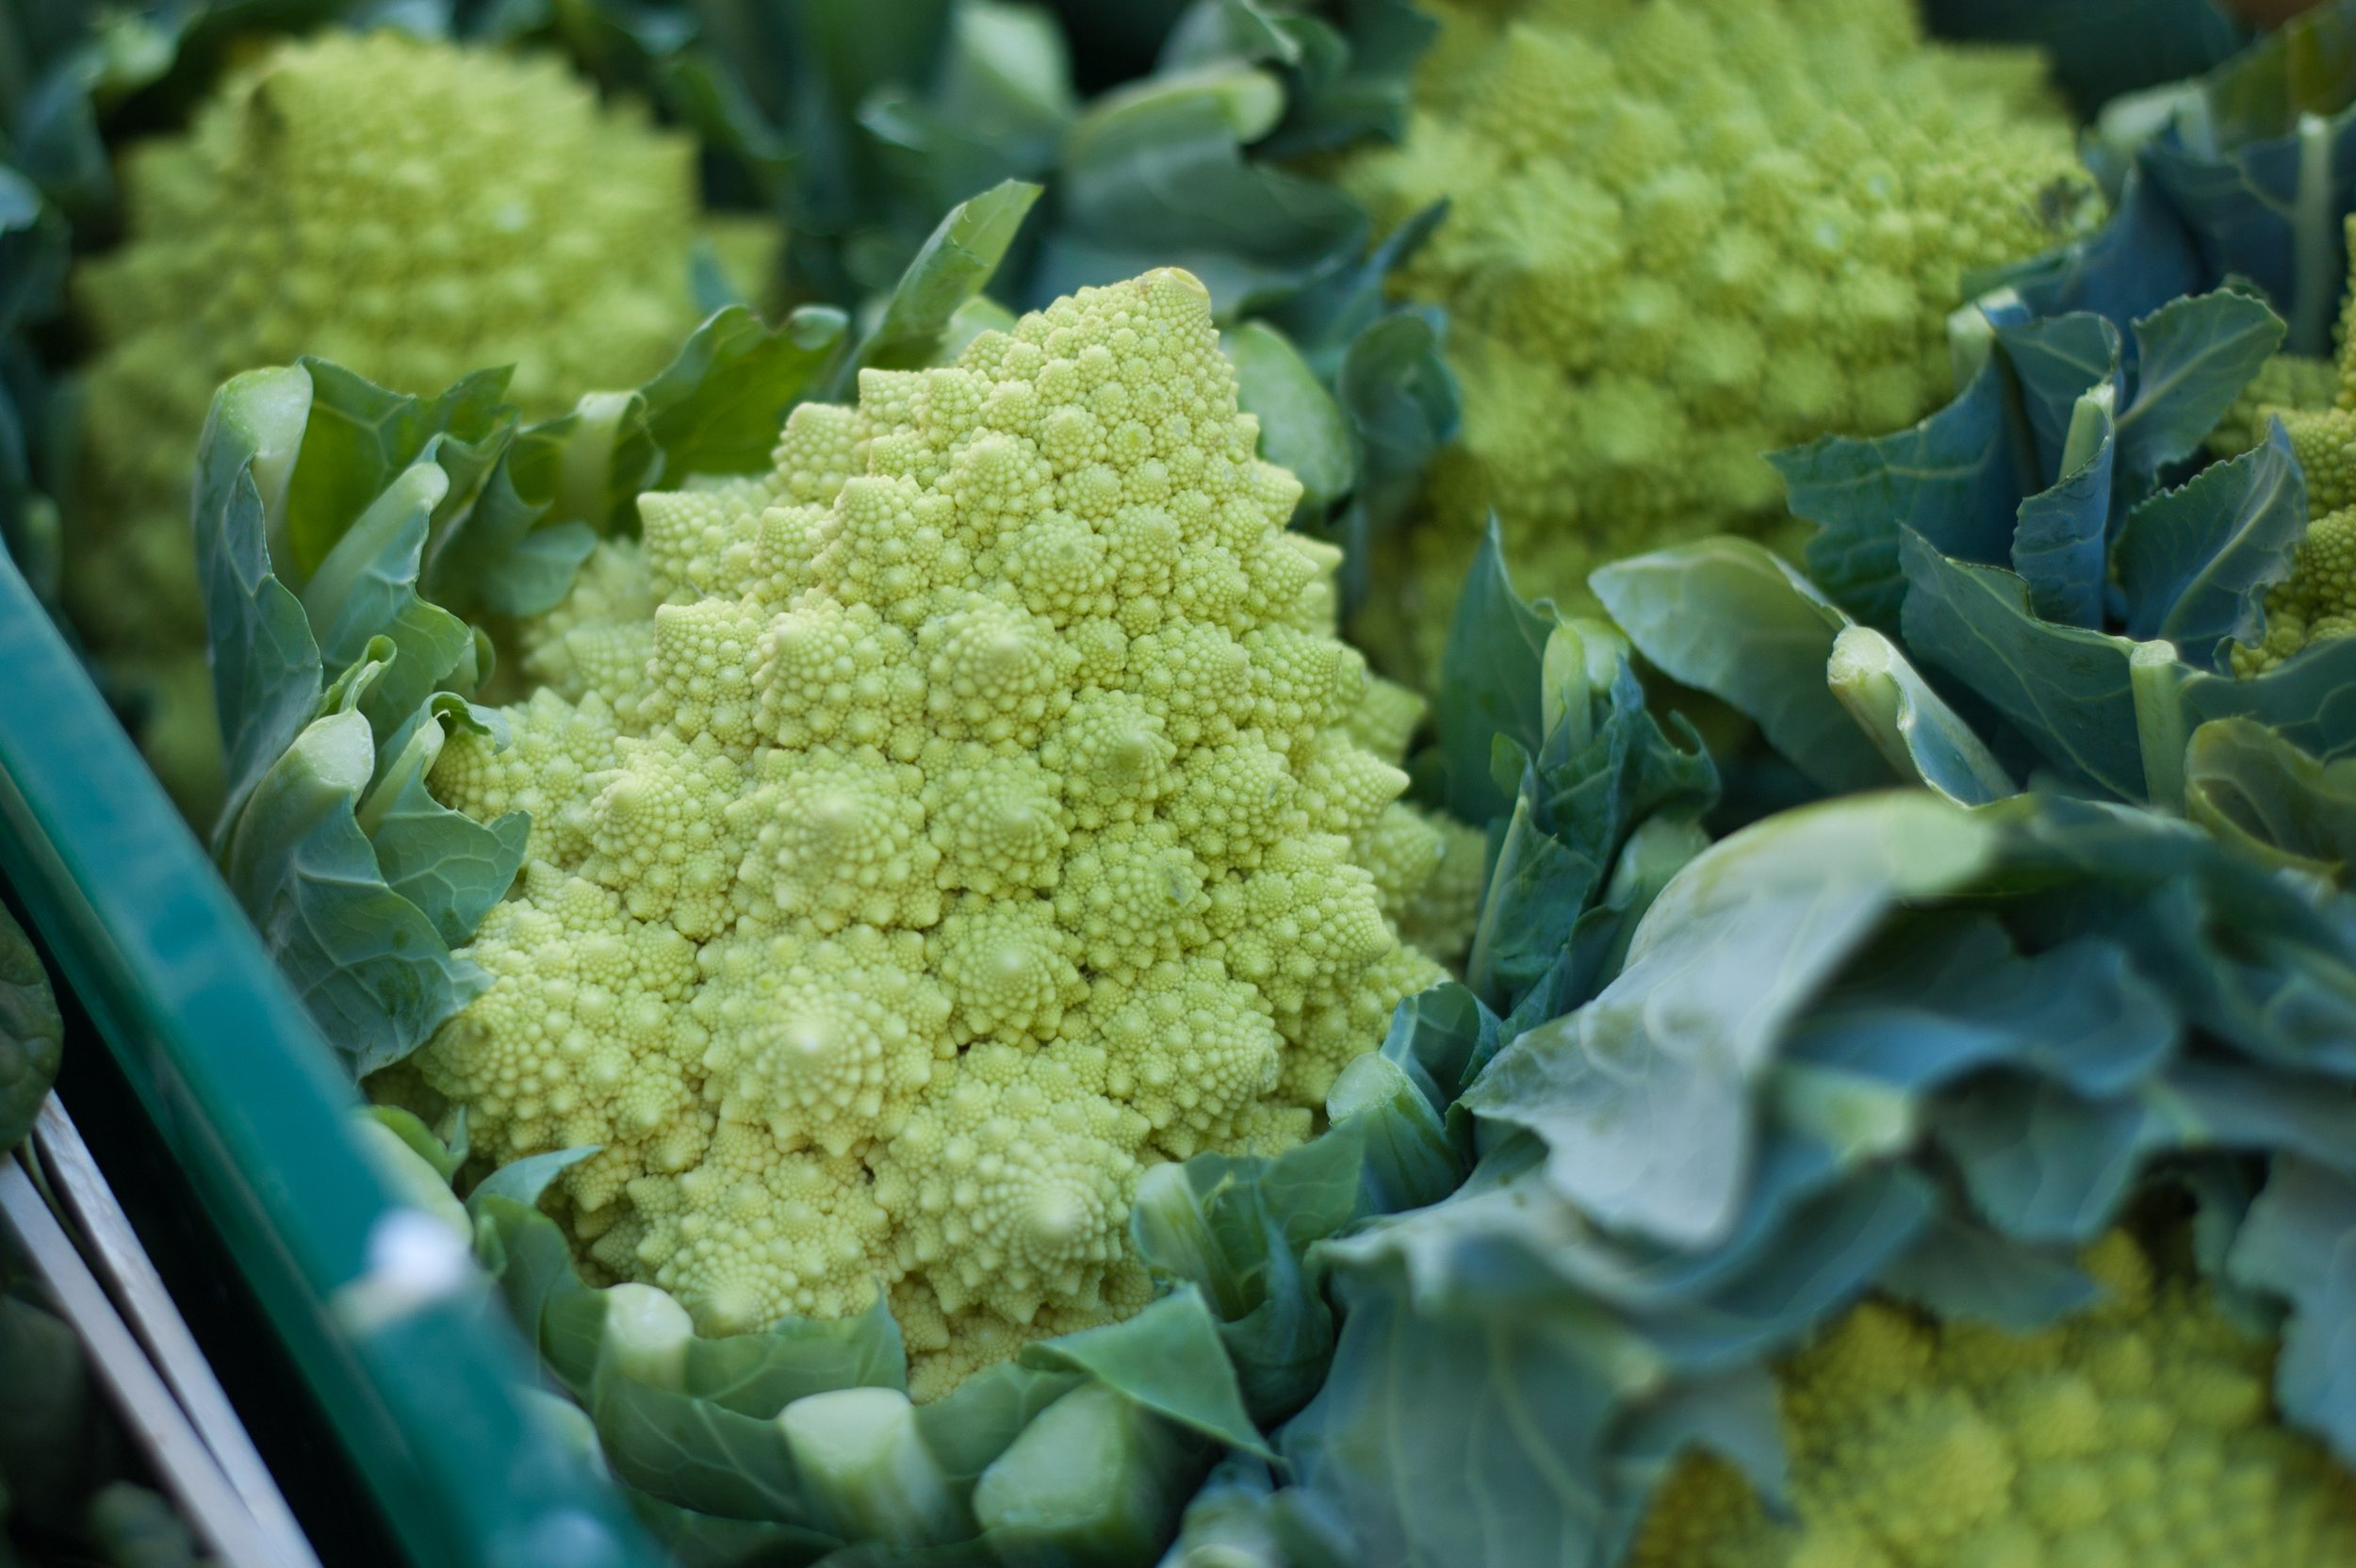 broccoli-close-up-colors-76083.jpg